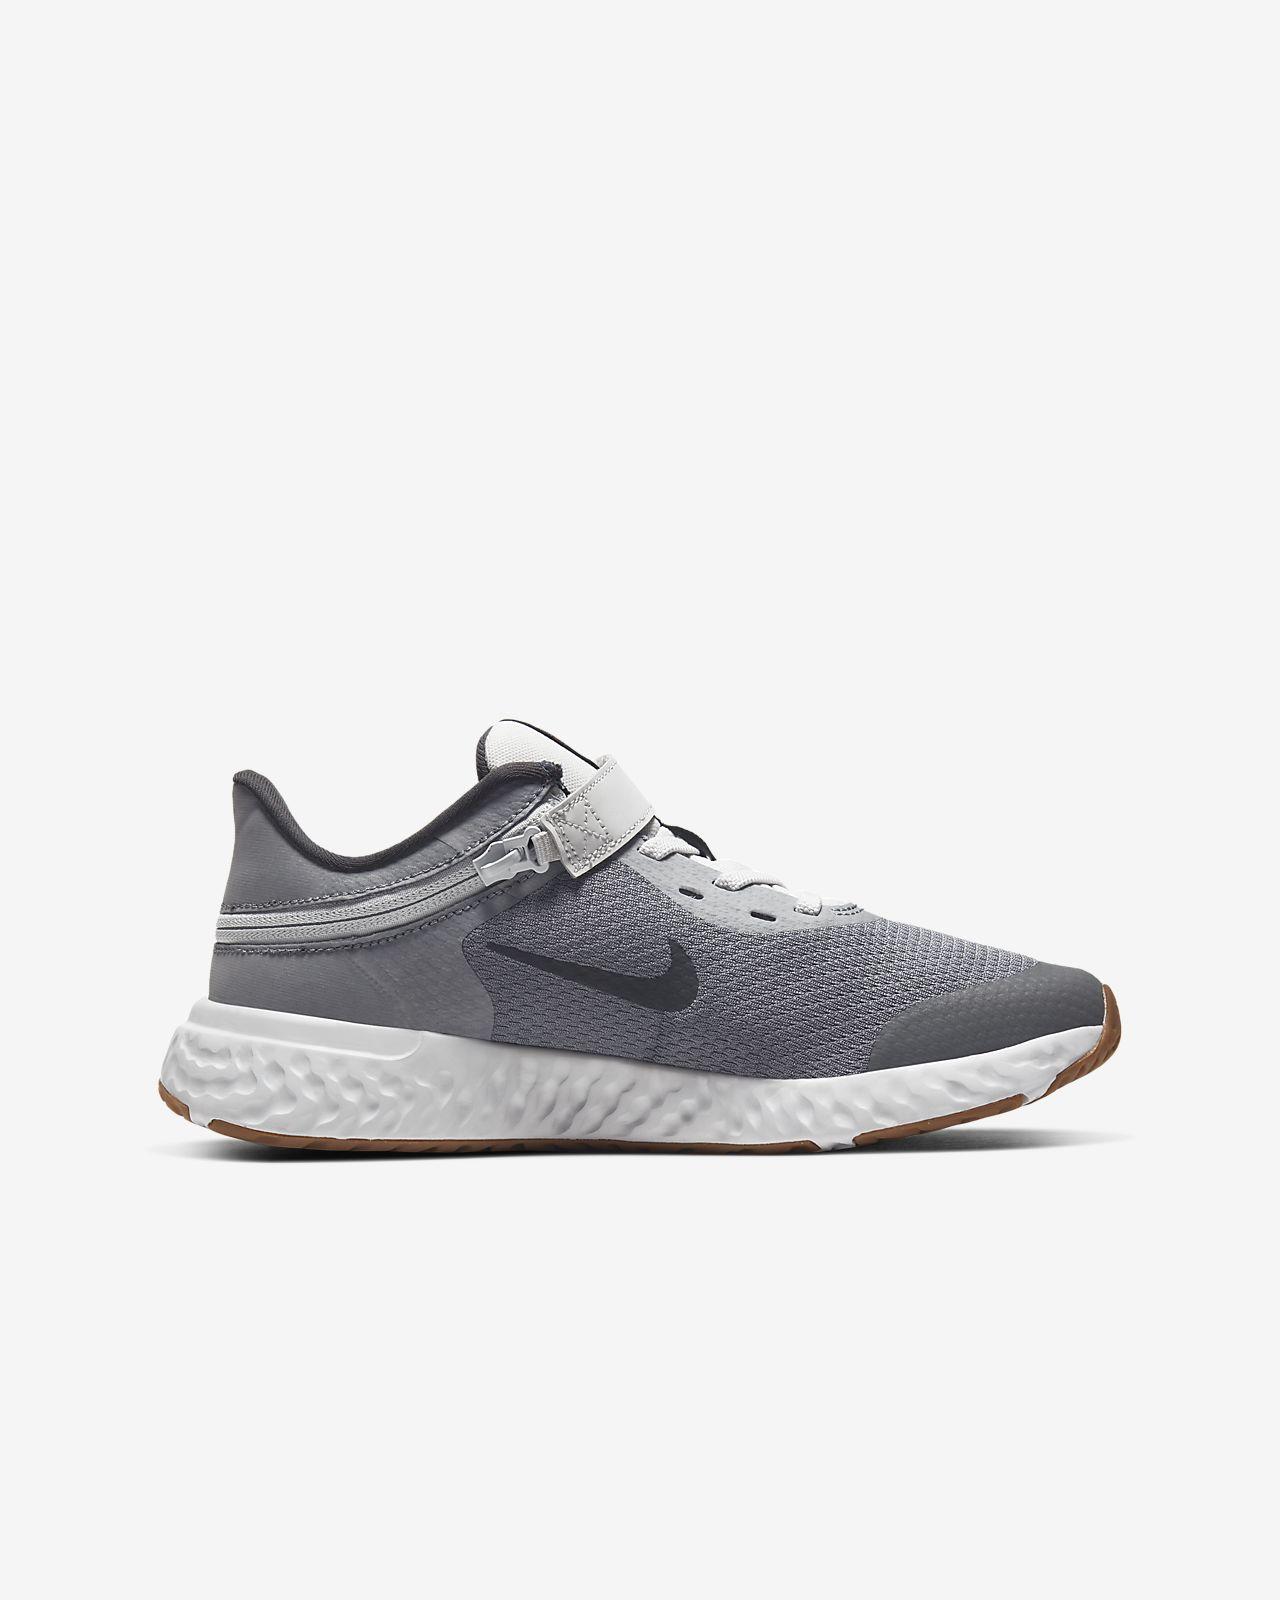 Sapatilhas de running Nike Revolution 5 FlyEase Júnior (largas)